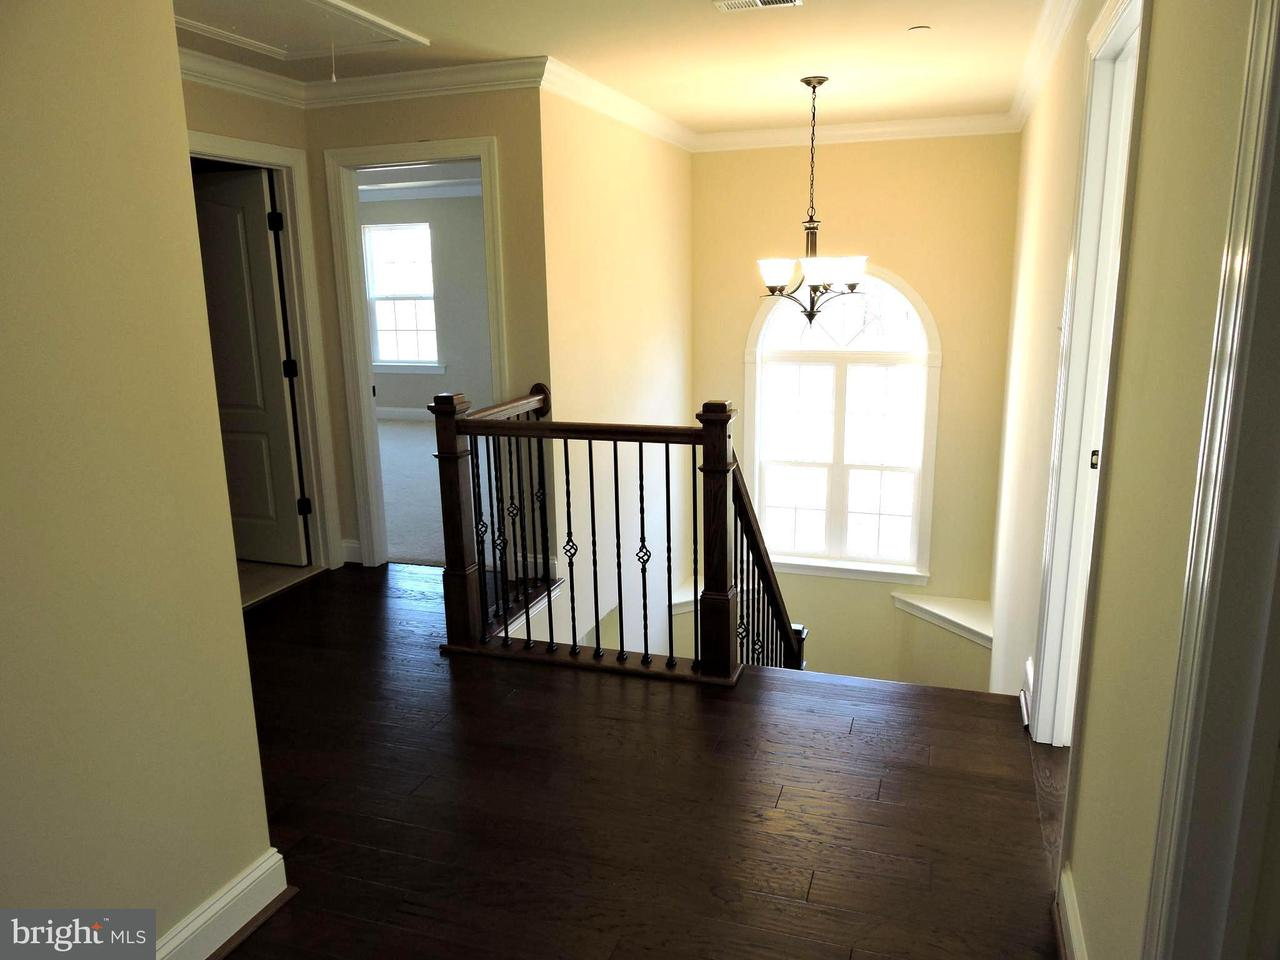 独户住宅 为 销售 在 7694 Knotting Hill Lane 7694 Knotting Hill Lane Port Tobacco, 马里兰州 20677 美国